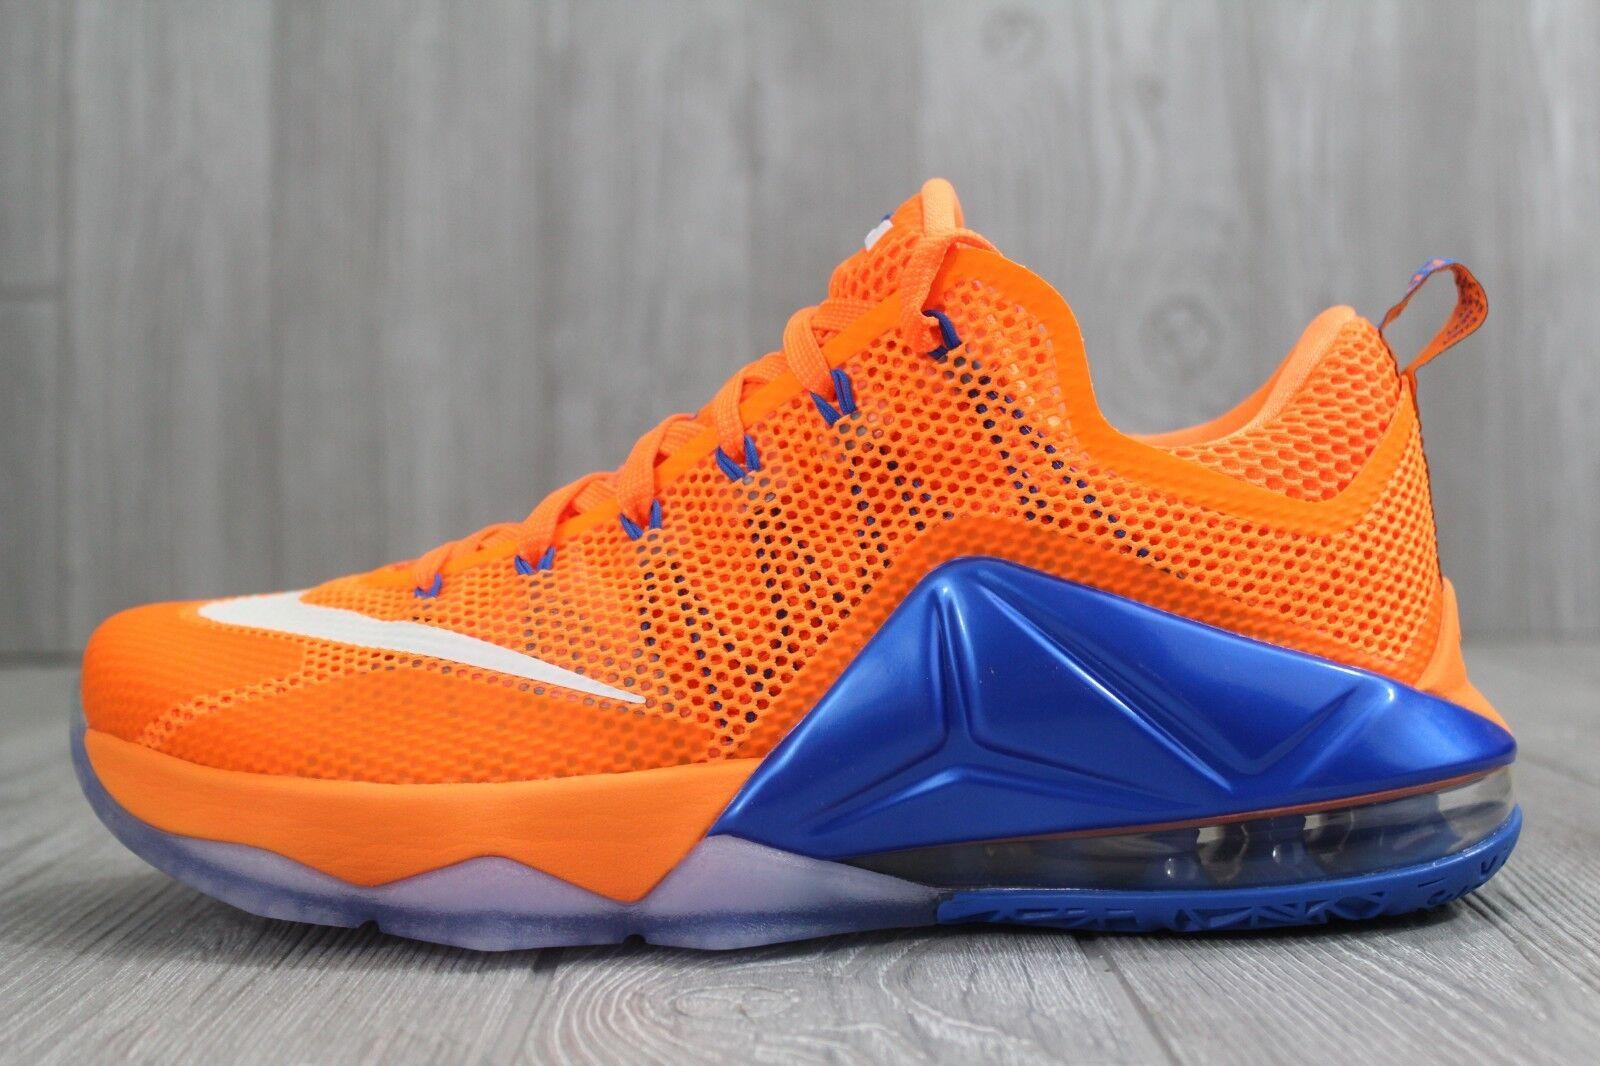 32 Nike Lebron XII 12 Low Citrus Knicks Basketball shoes Size 9.5 724557 838